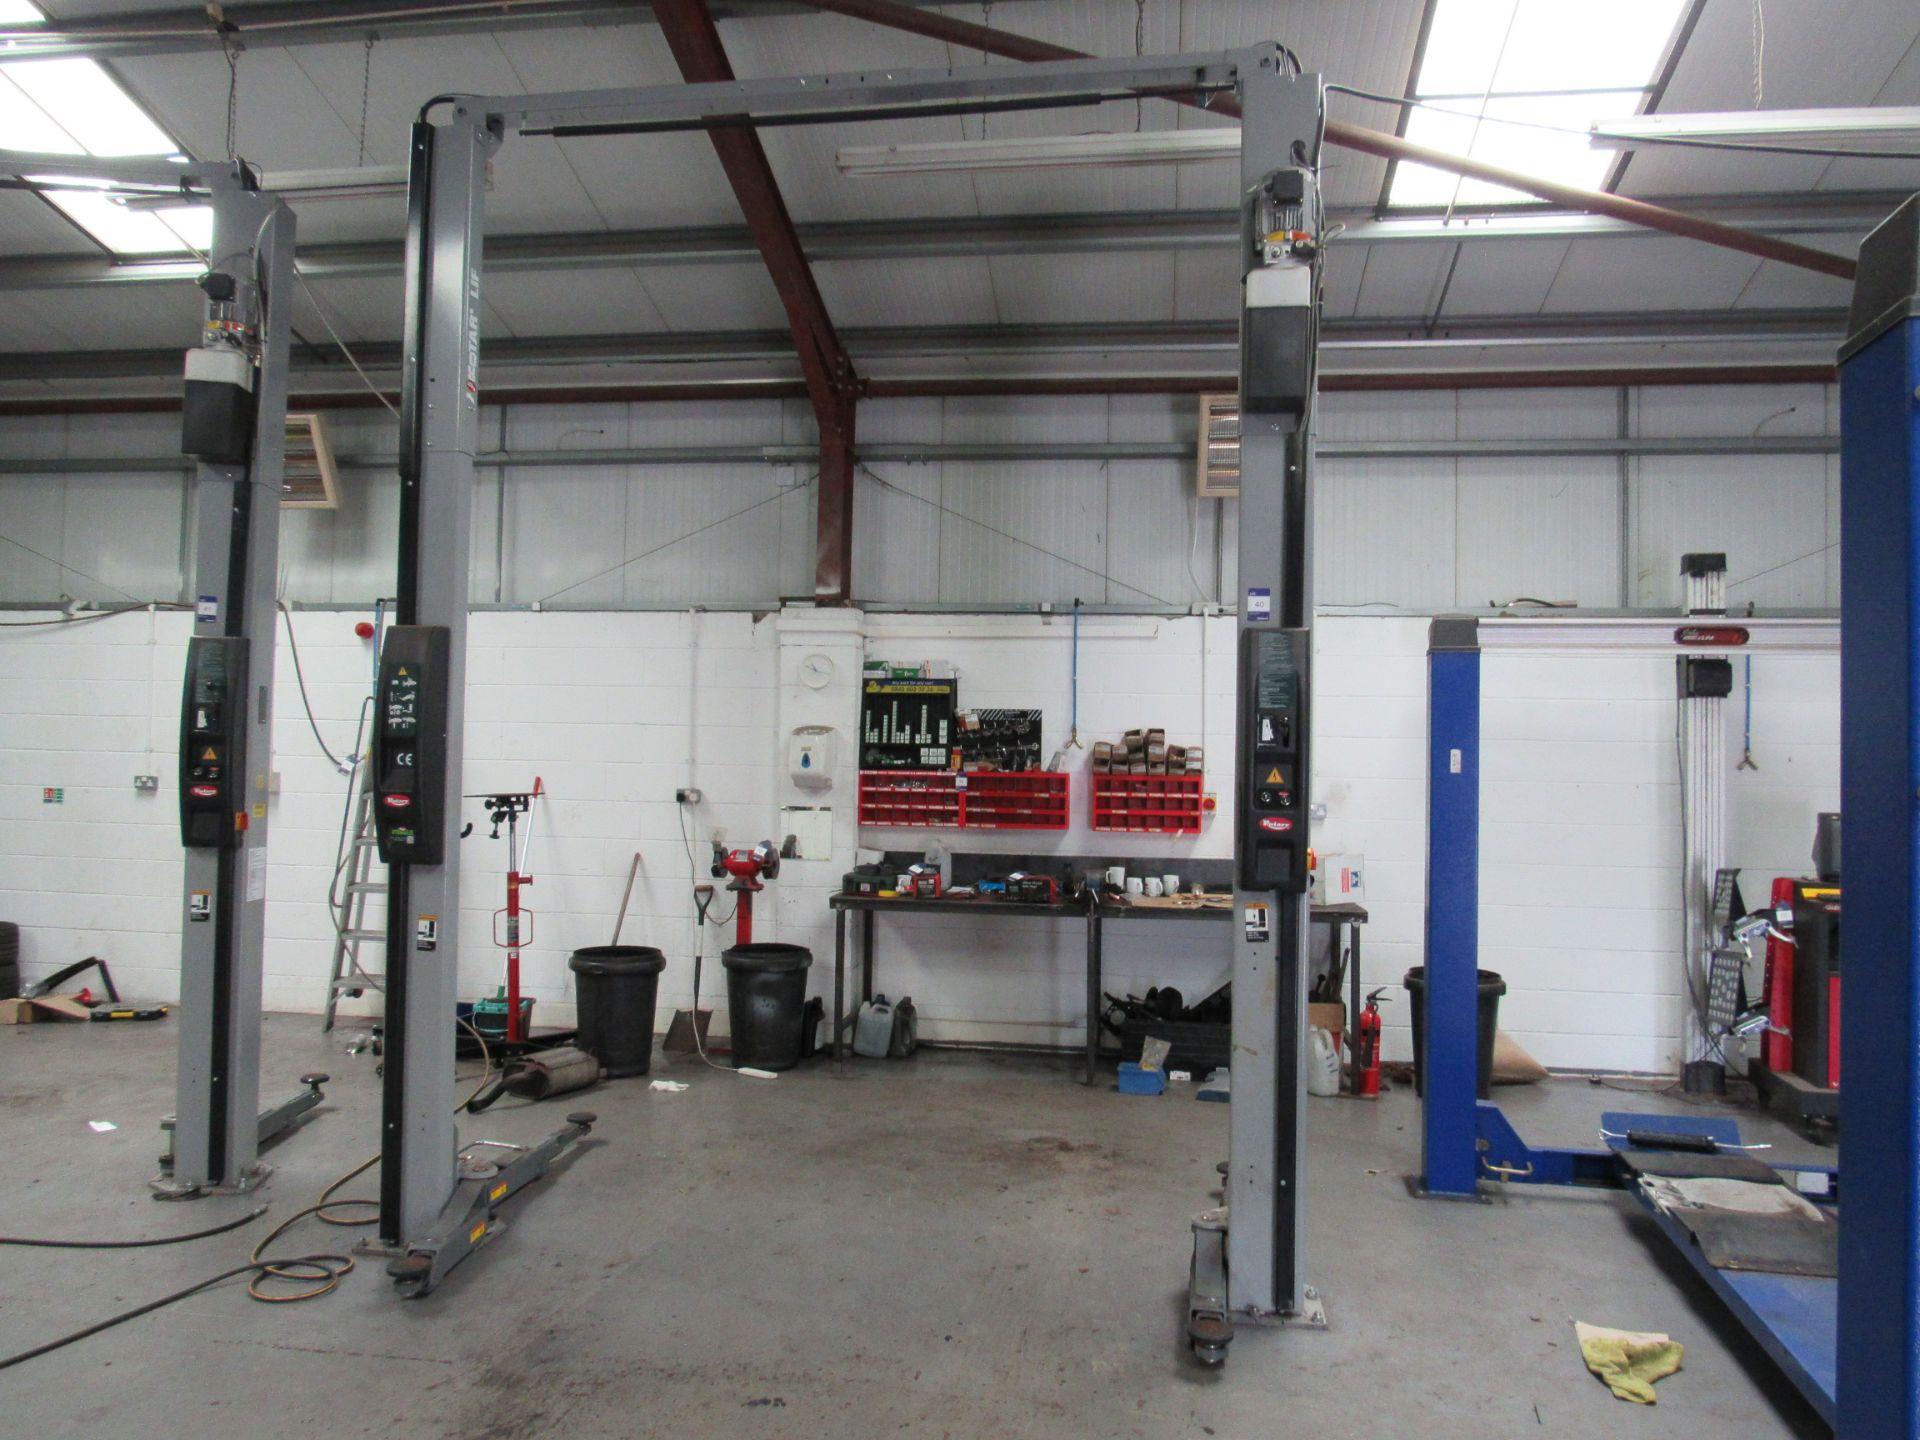 Lot 40 - Rotary Asymmetric Electro-Hydraulic Base SpoA3TUK – APWG 2 Post Lift with 3500kg Lifting Capacity,